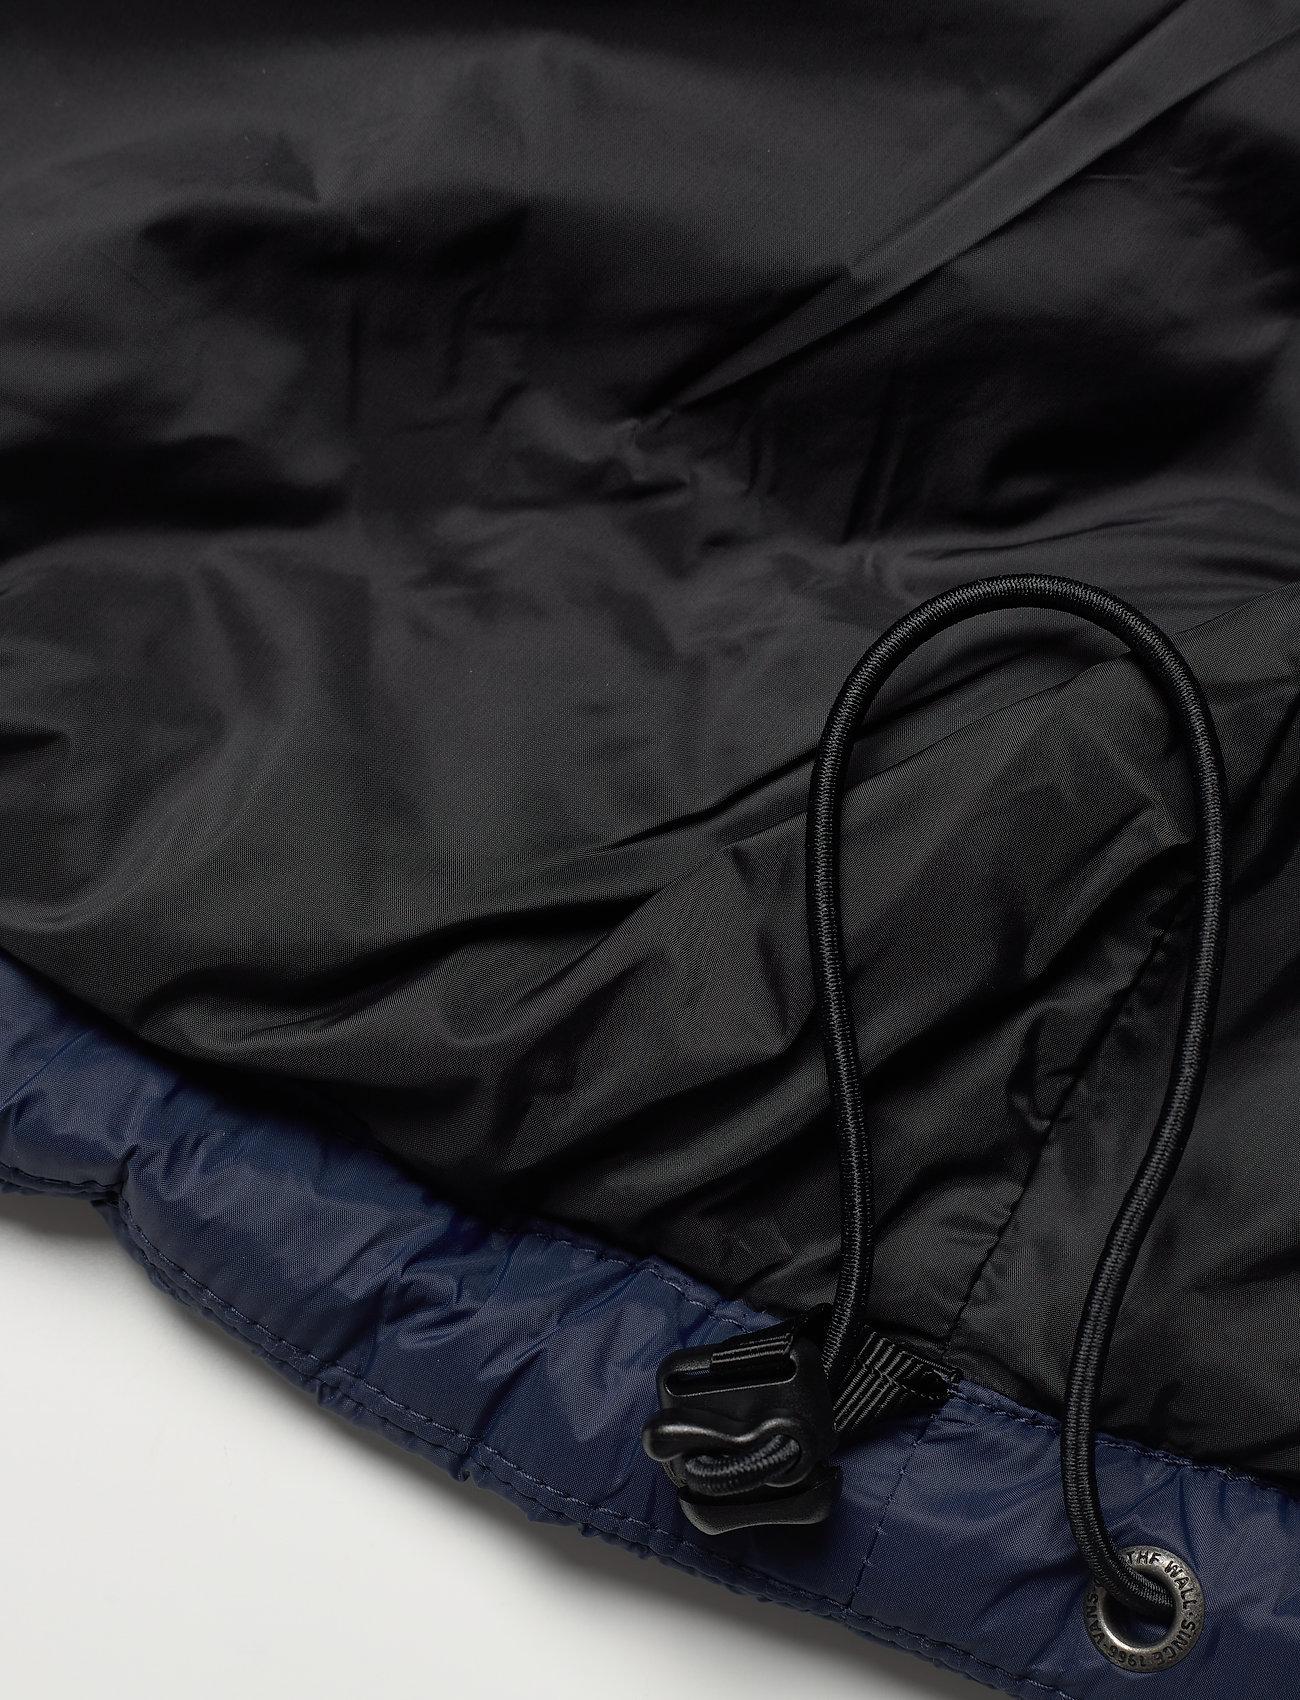 Woodcrest Ii (Dress Blues/port Royale) (155 €) - VANS UZKCX